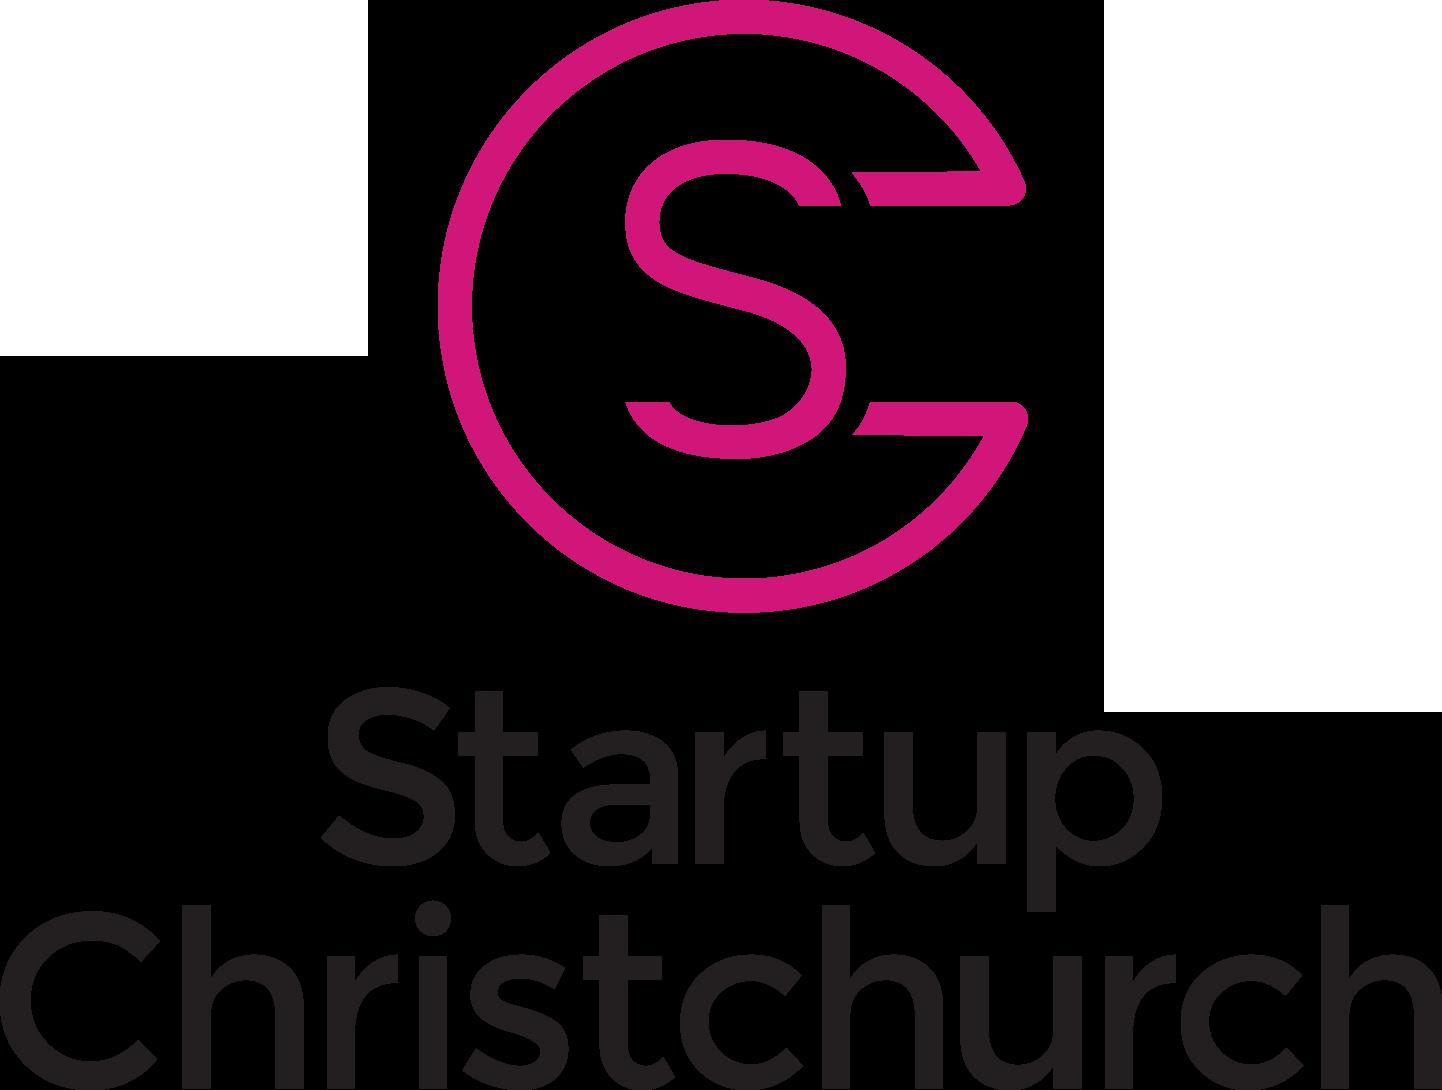 Startup Christchurch Logo Square.png